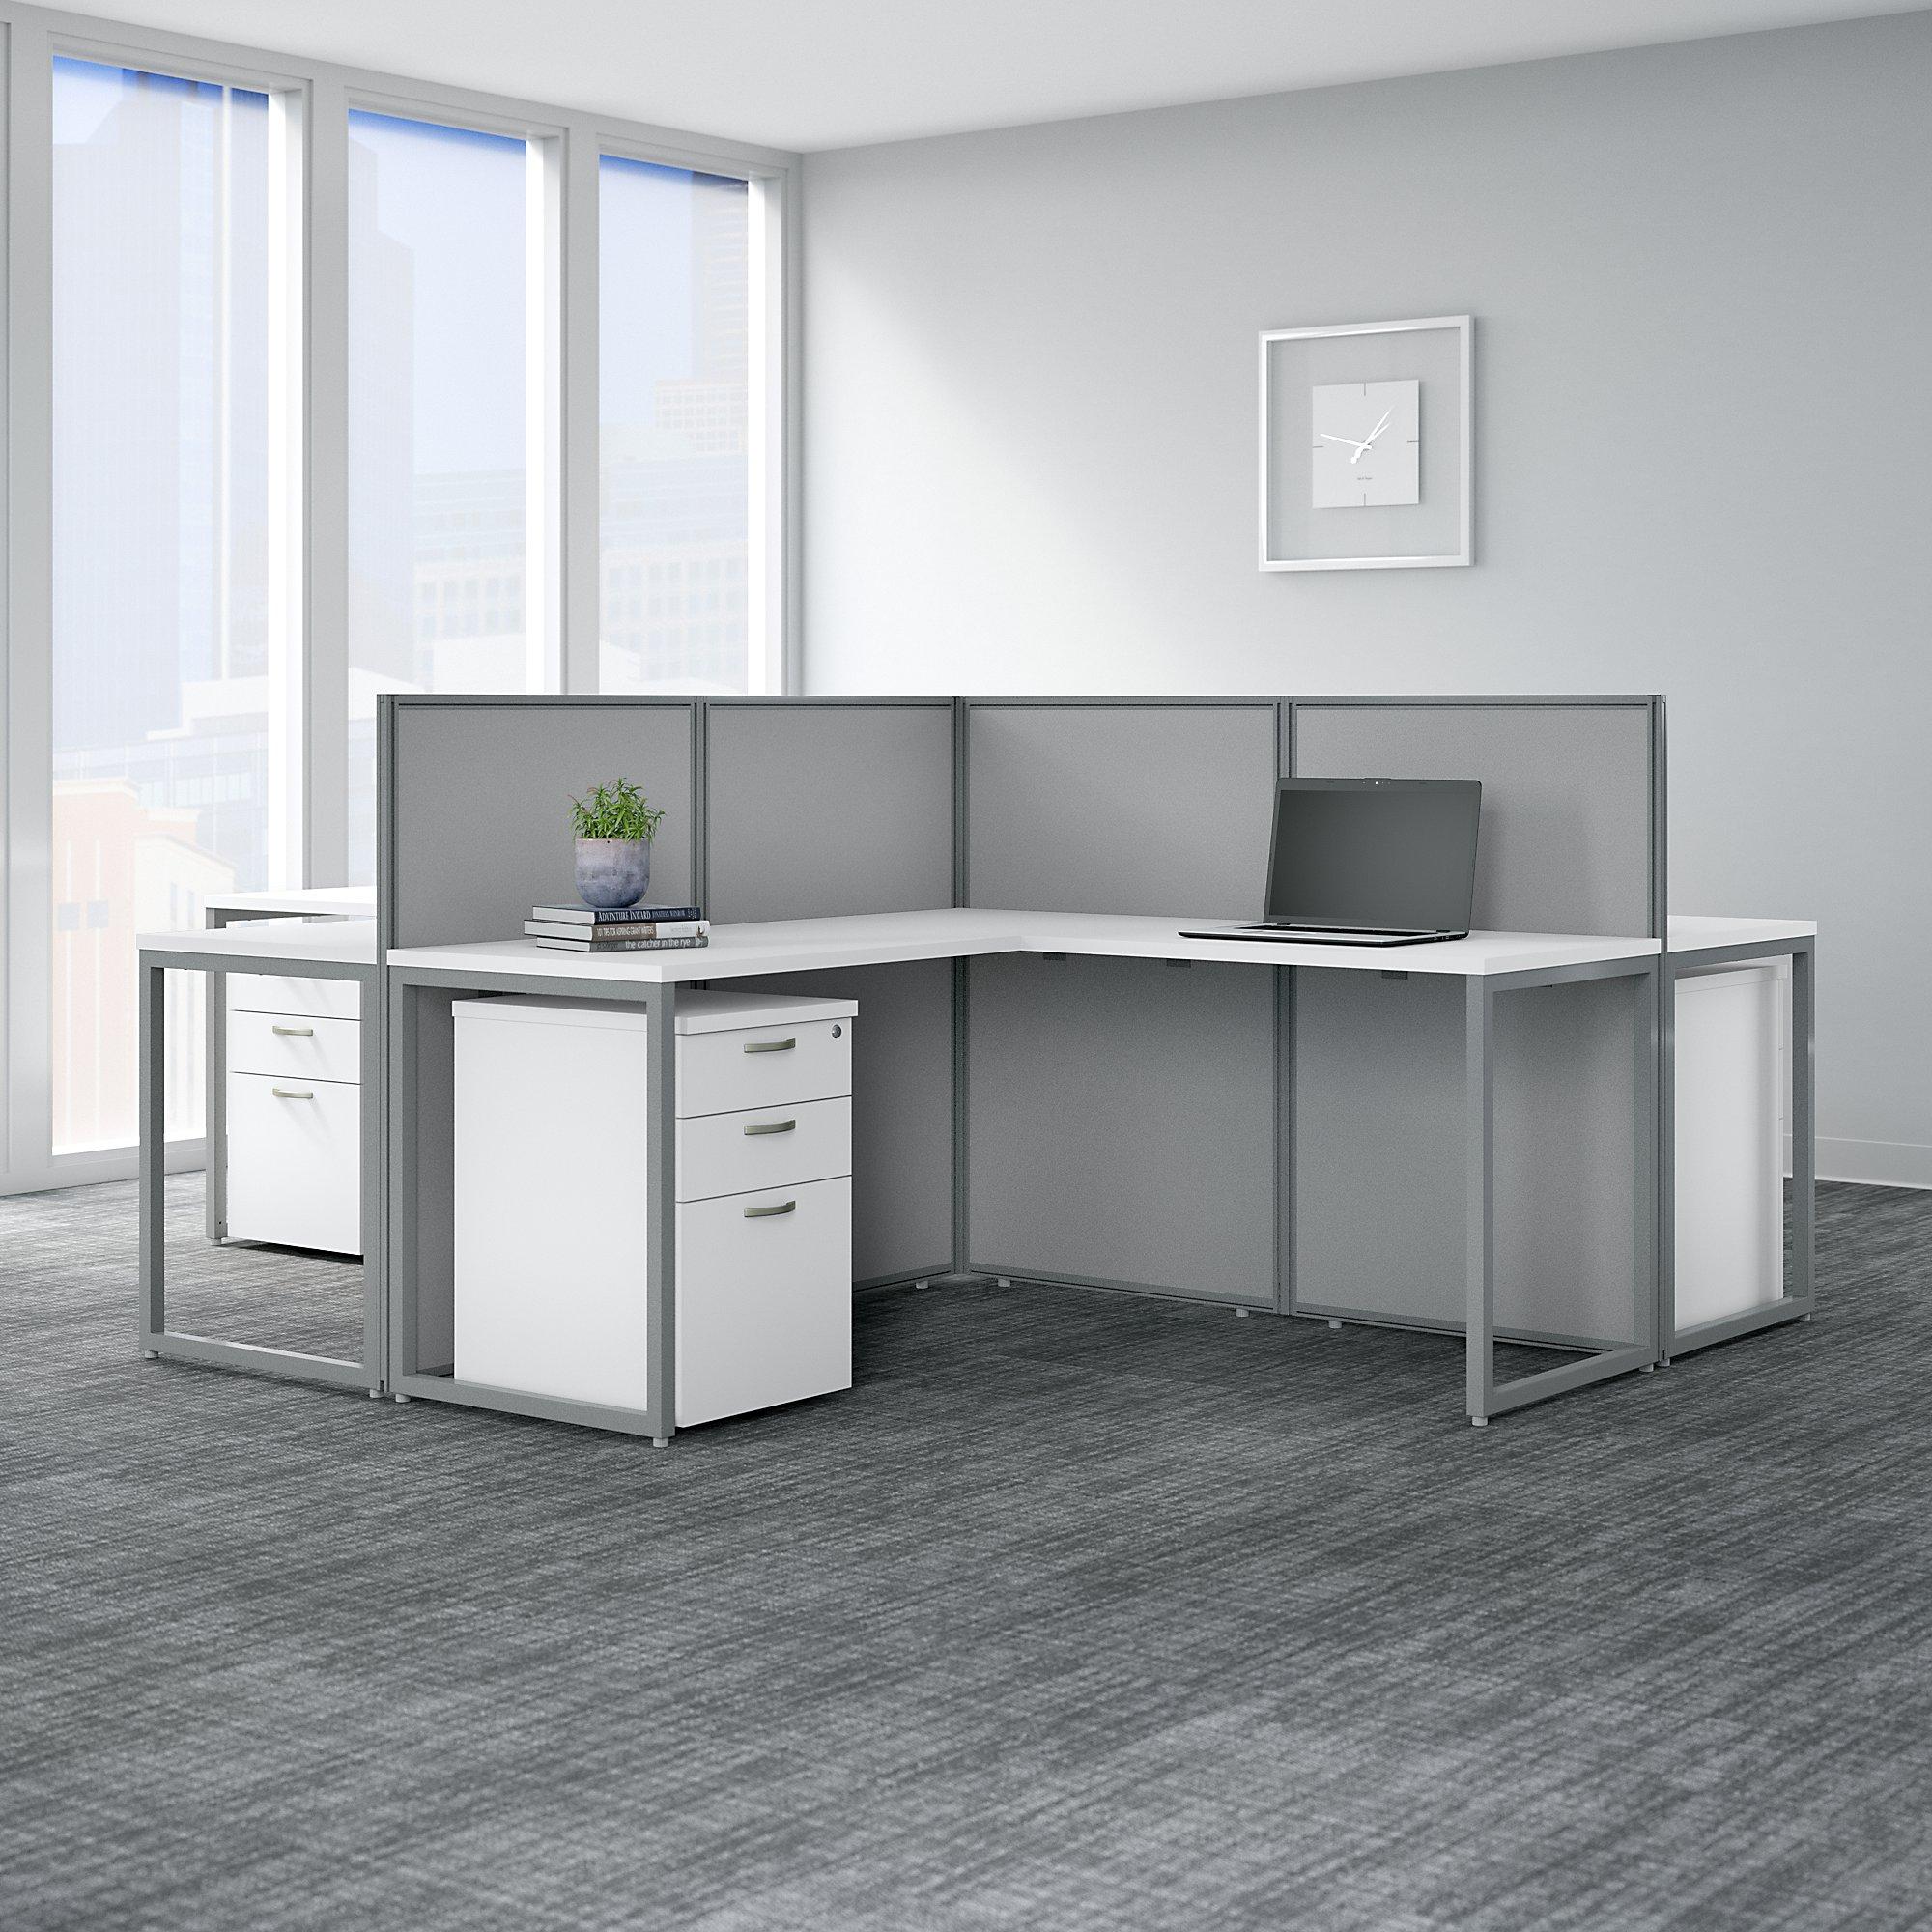 white 4 person modular cubicle configuration